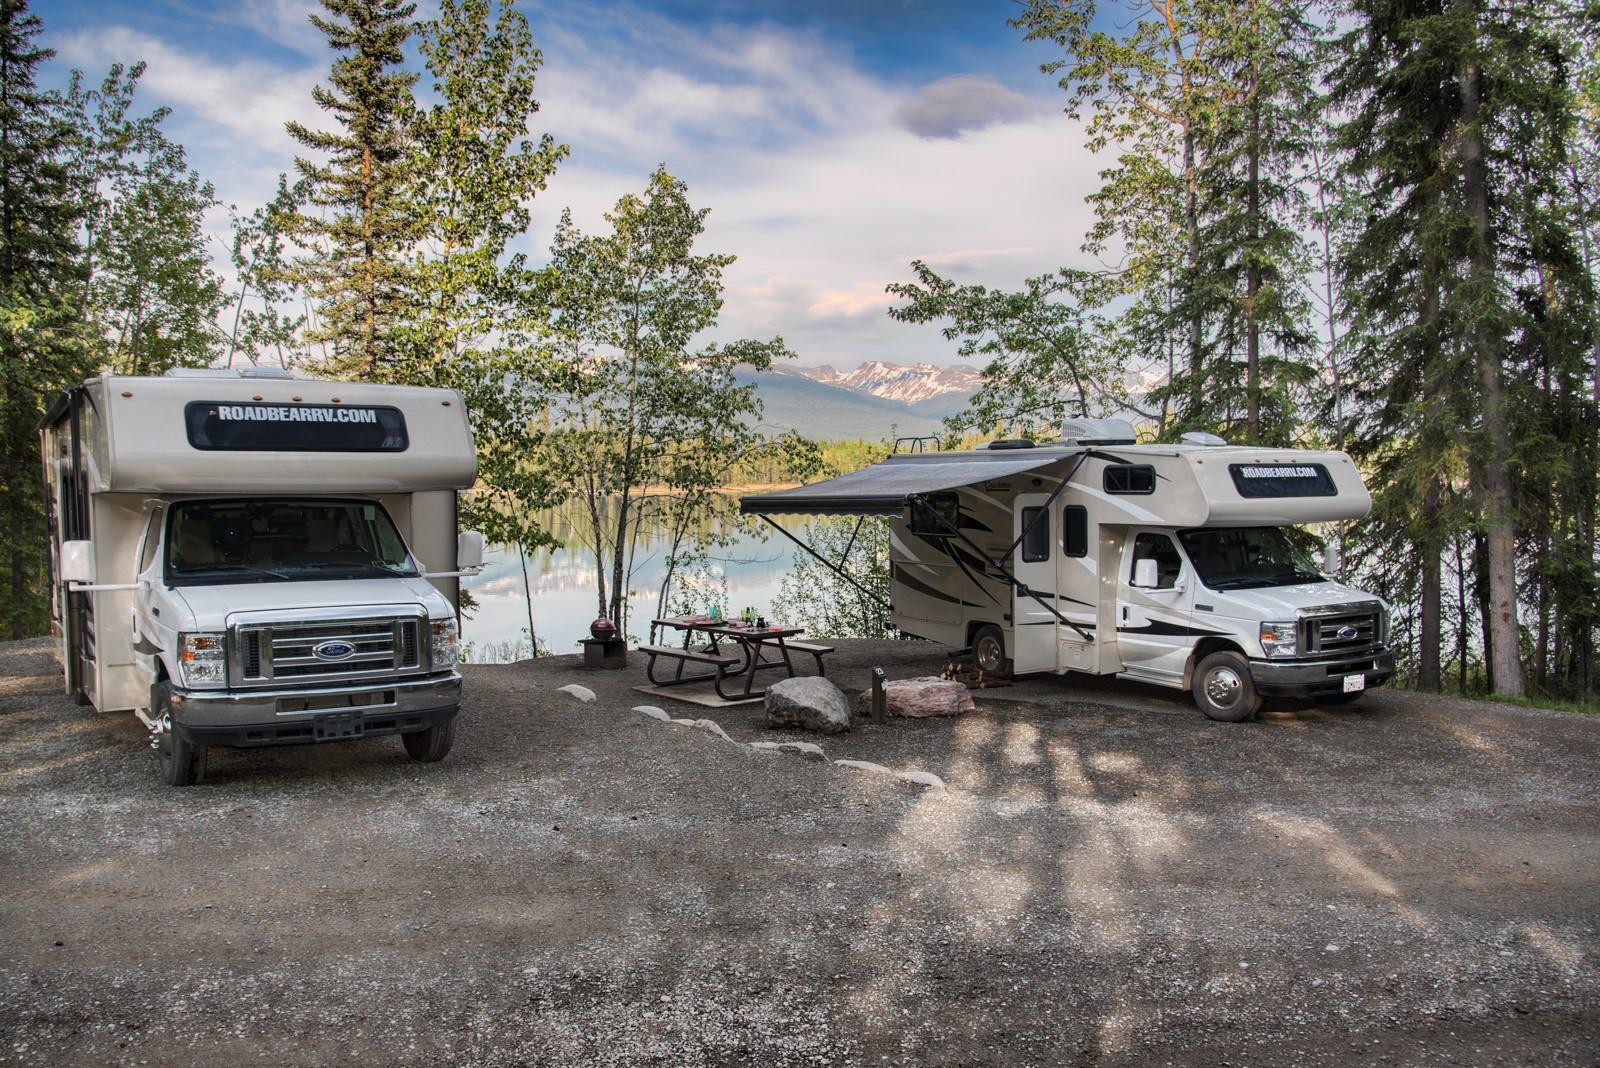 Road Bear campinghygge